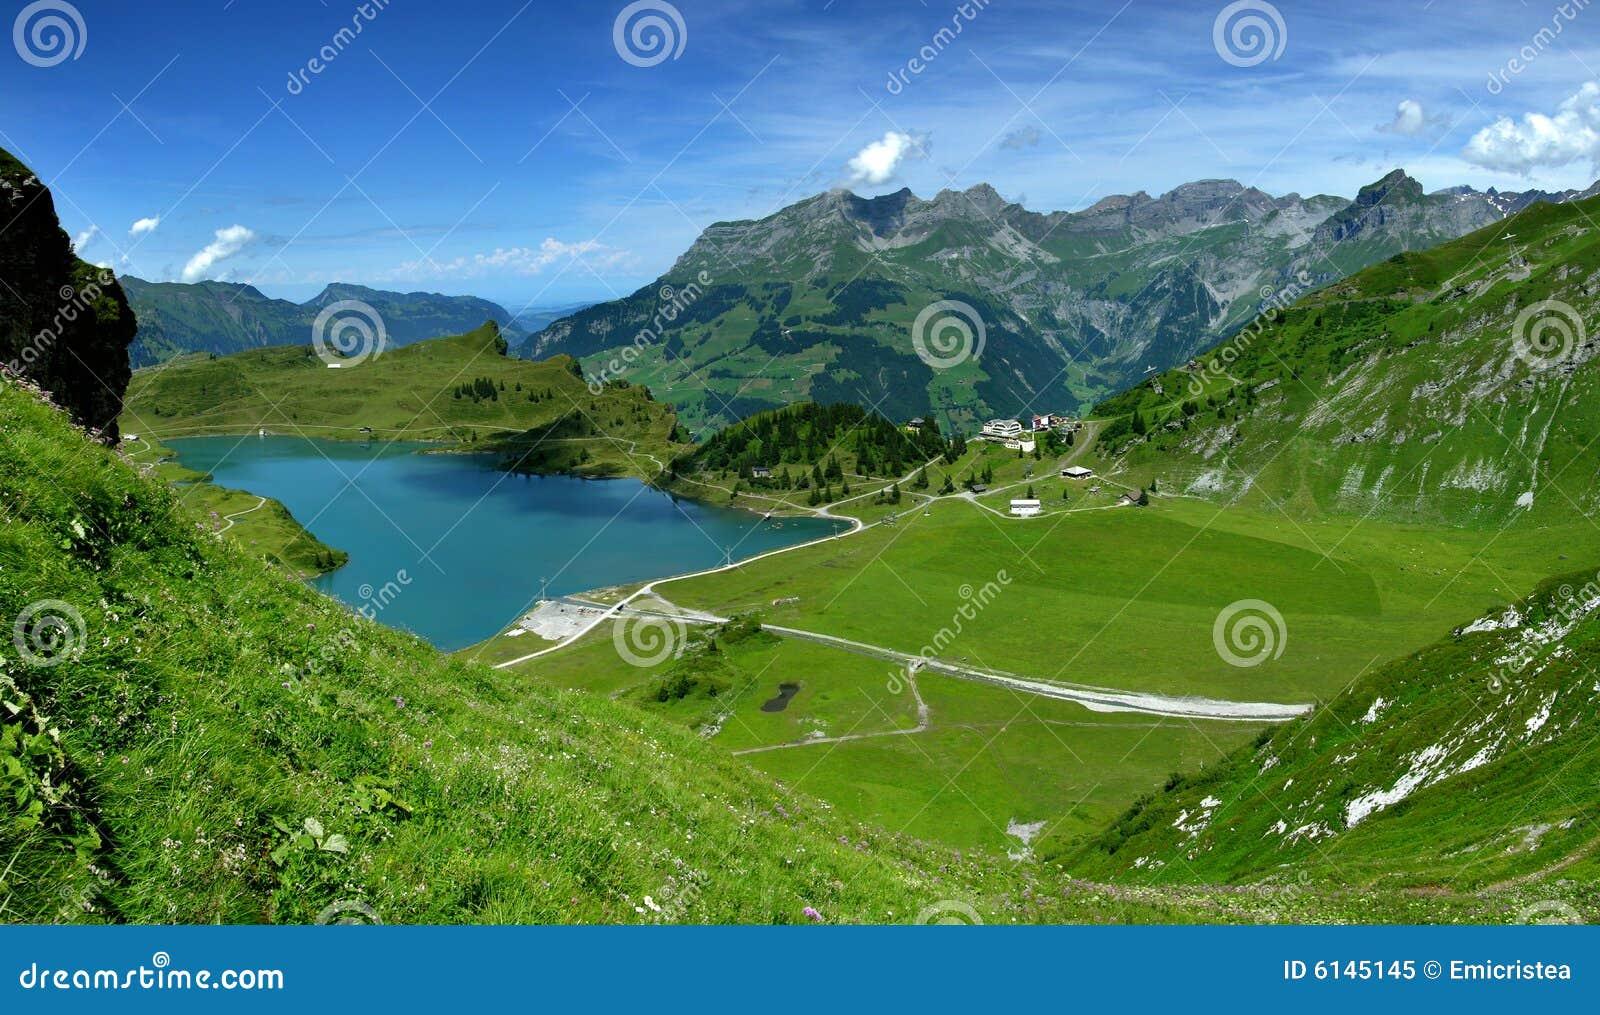 Mountain lake in Alps (Switzerland)